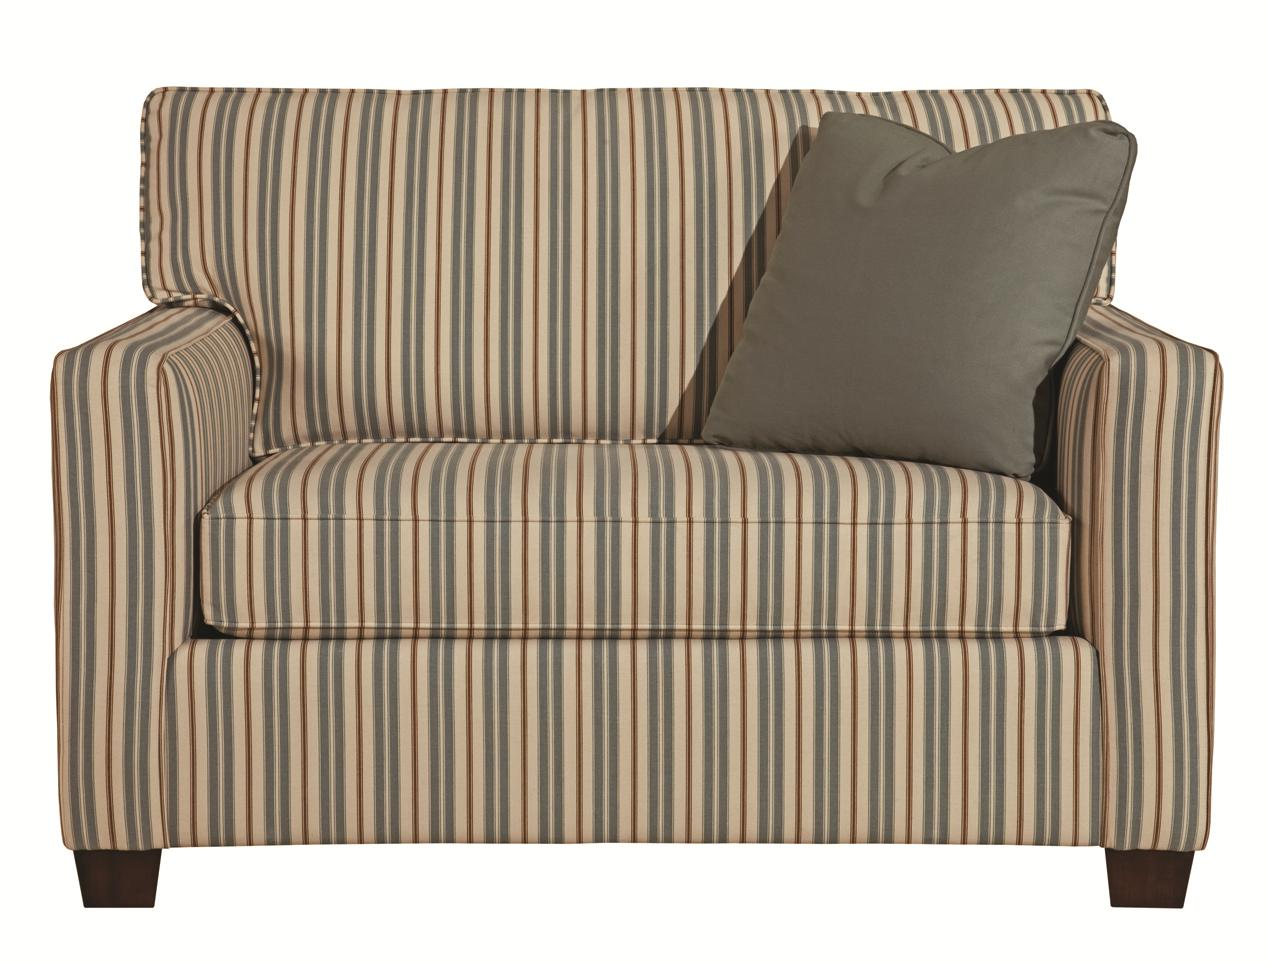 Brooke Sleeper Chair by Kincaid Furniture at Malouf Furniture Co.